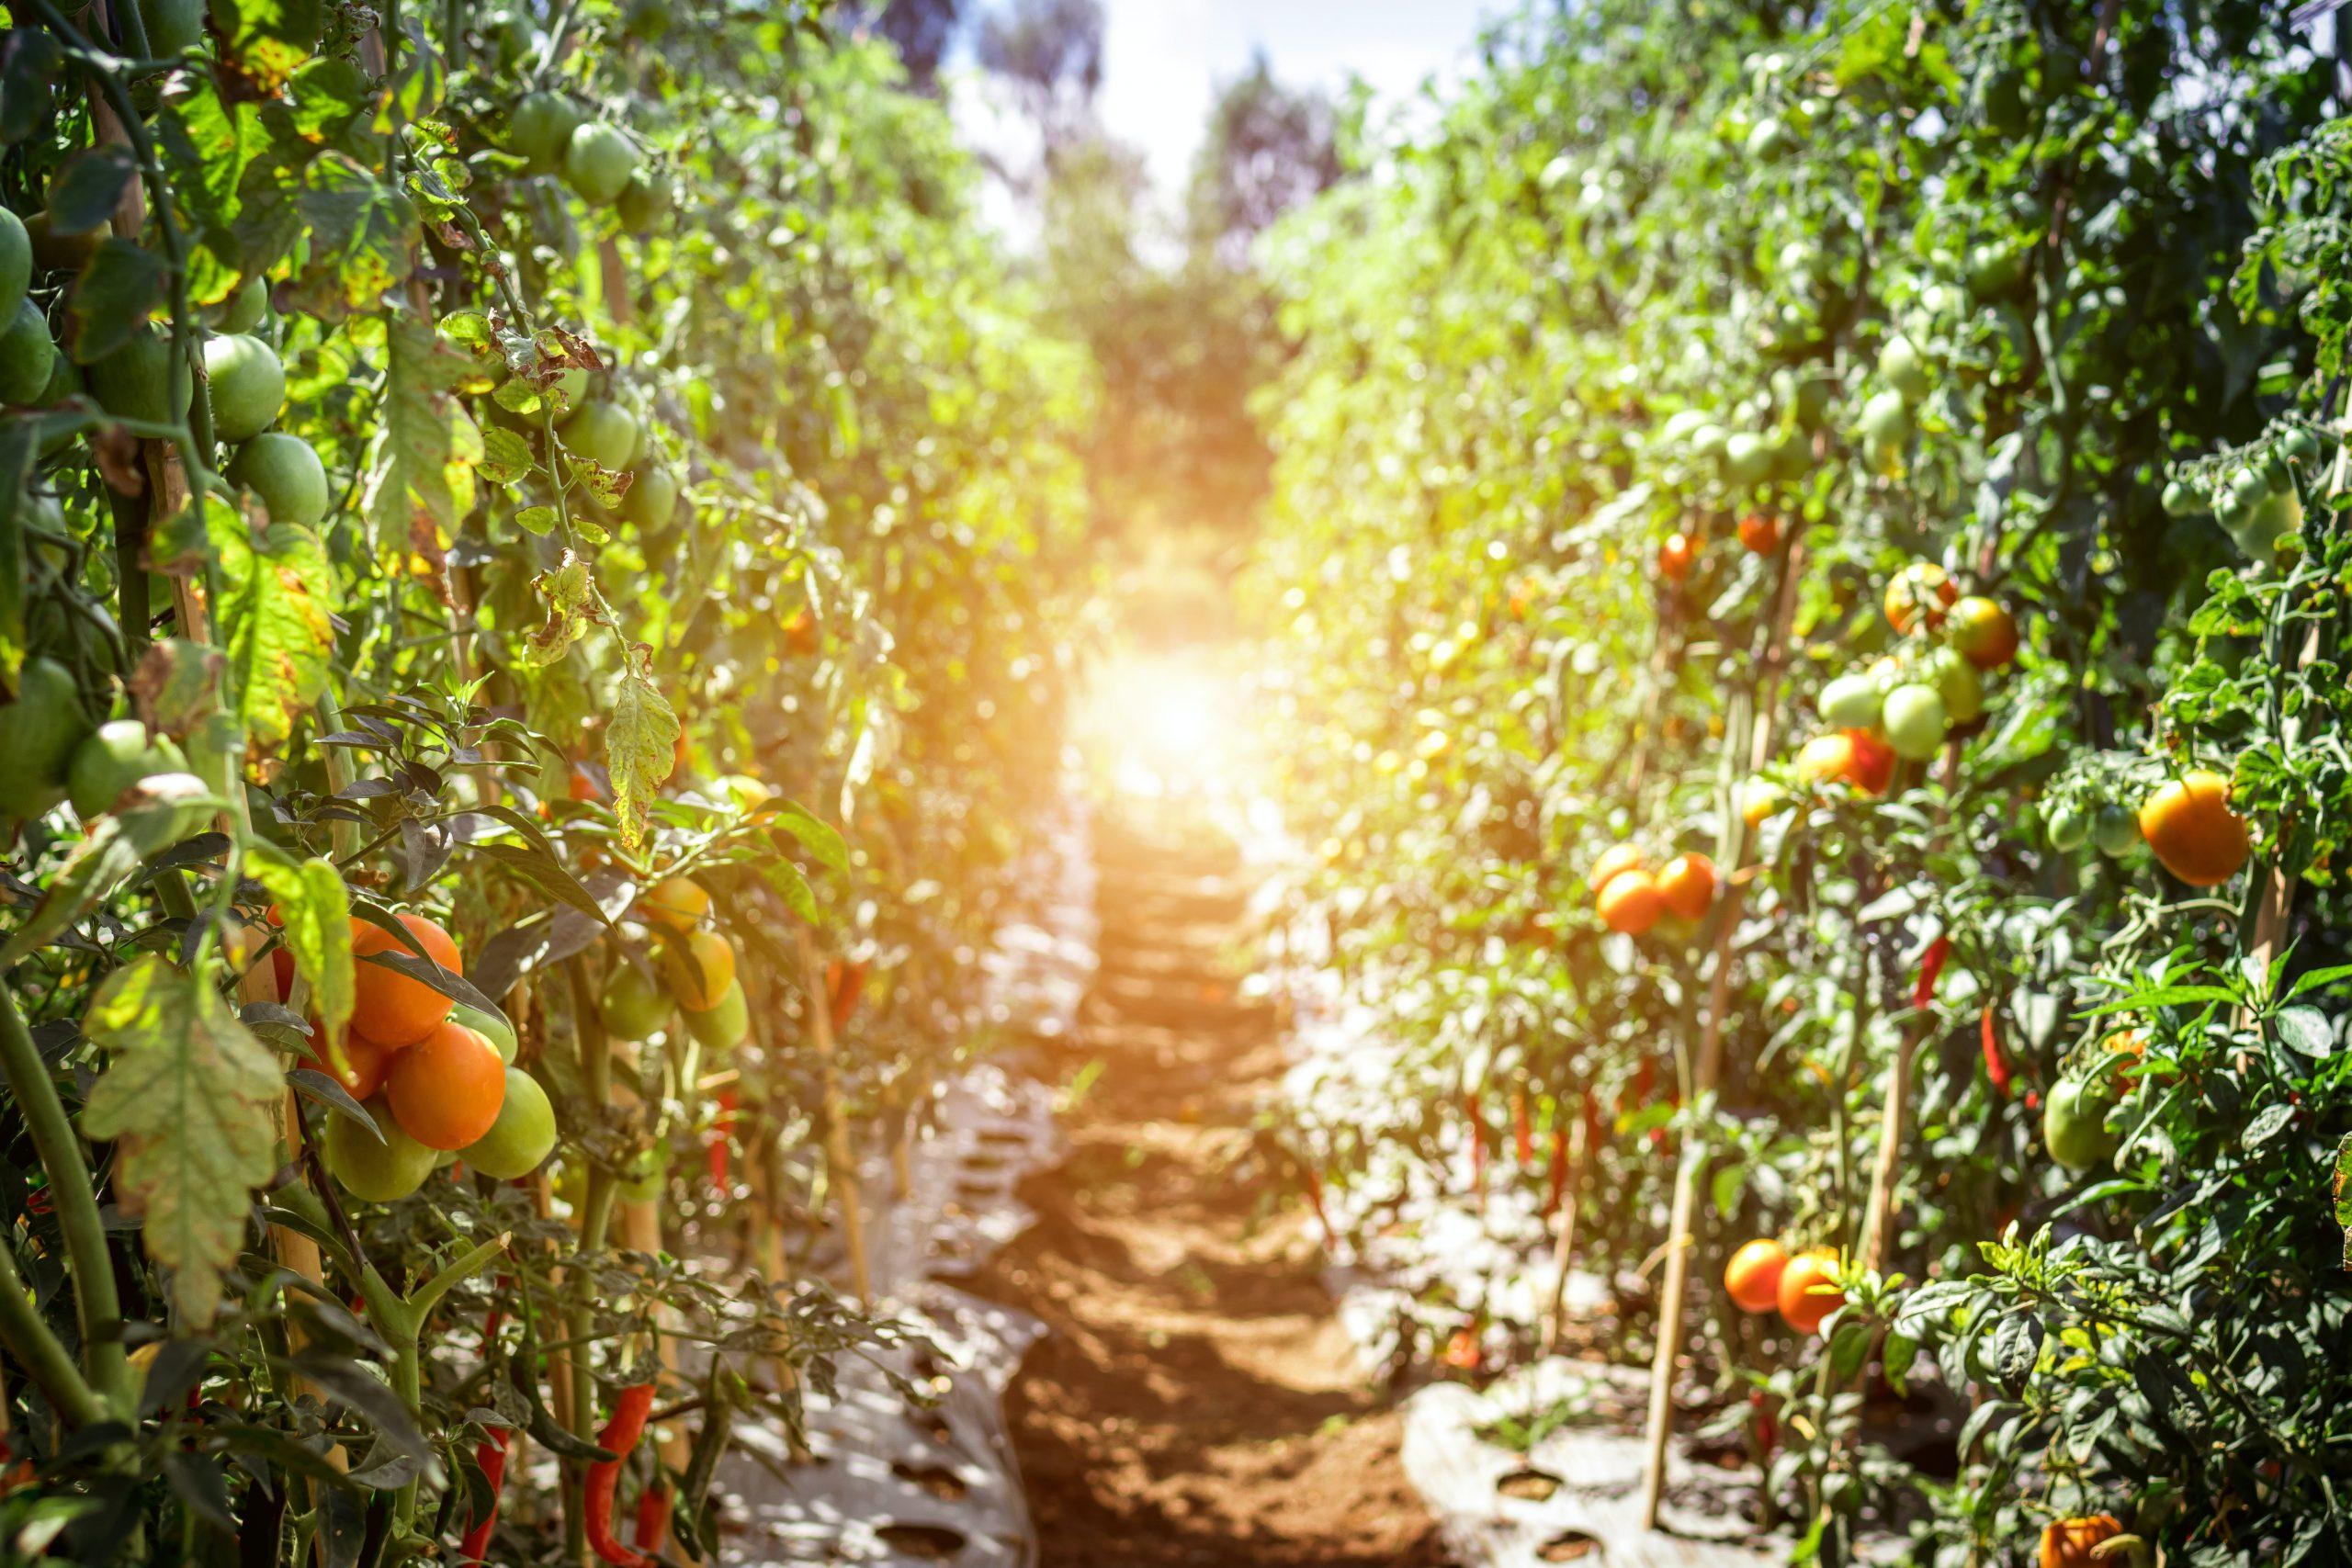 path between tomato plants